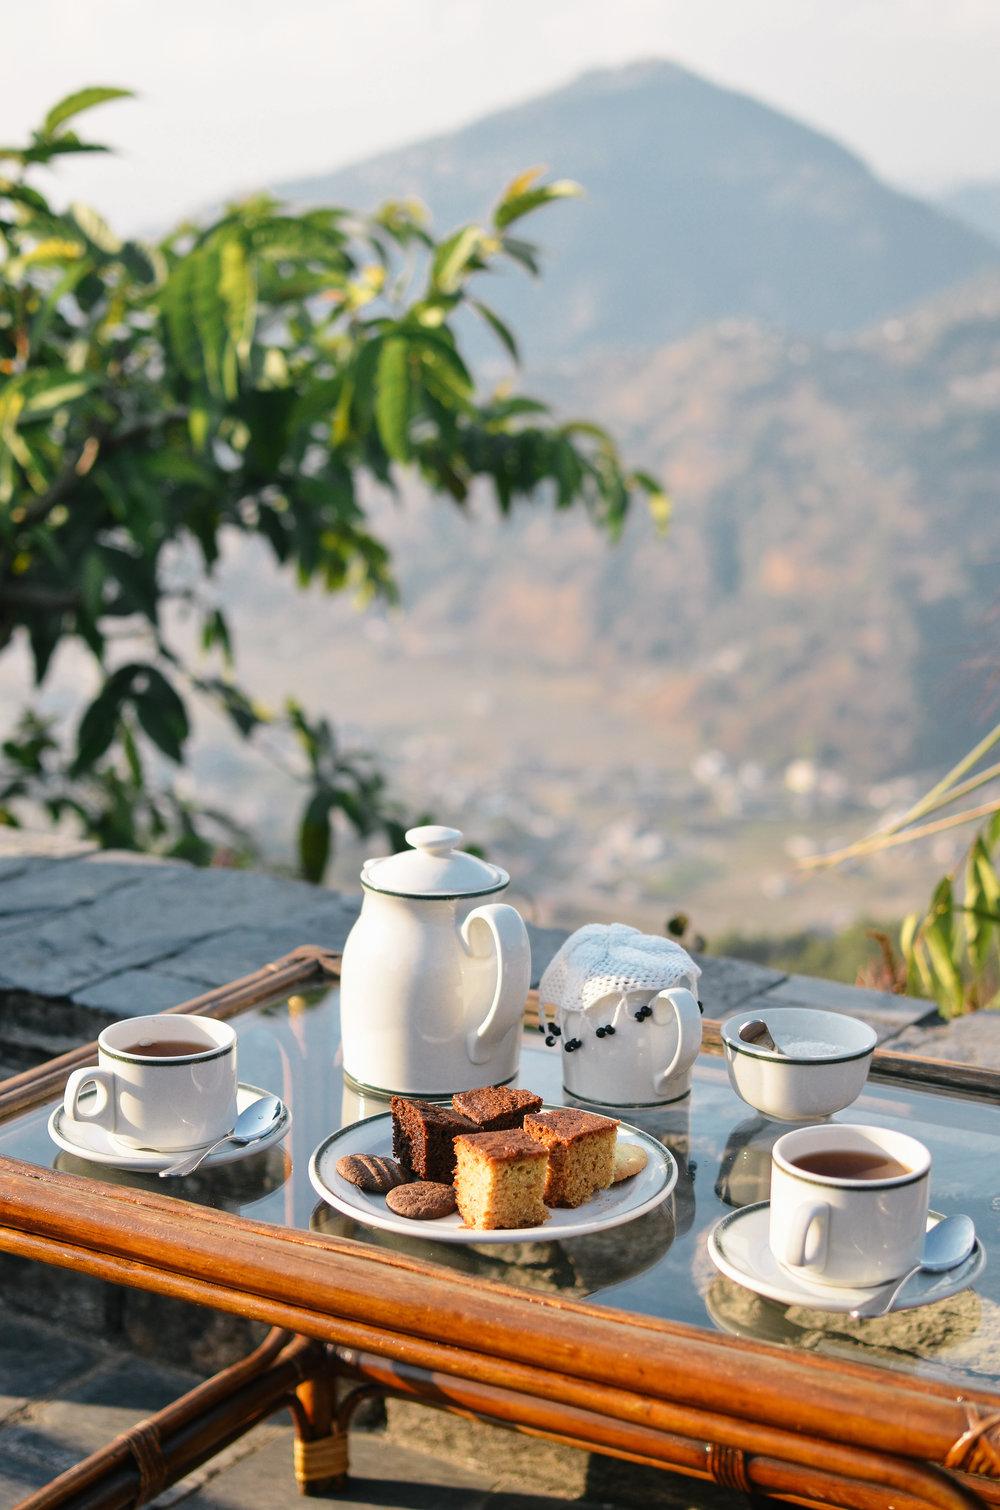 Pokara-Mountain_Lodge-Nepal-LifeonPine_DSC_0696.jpg